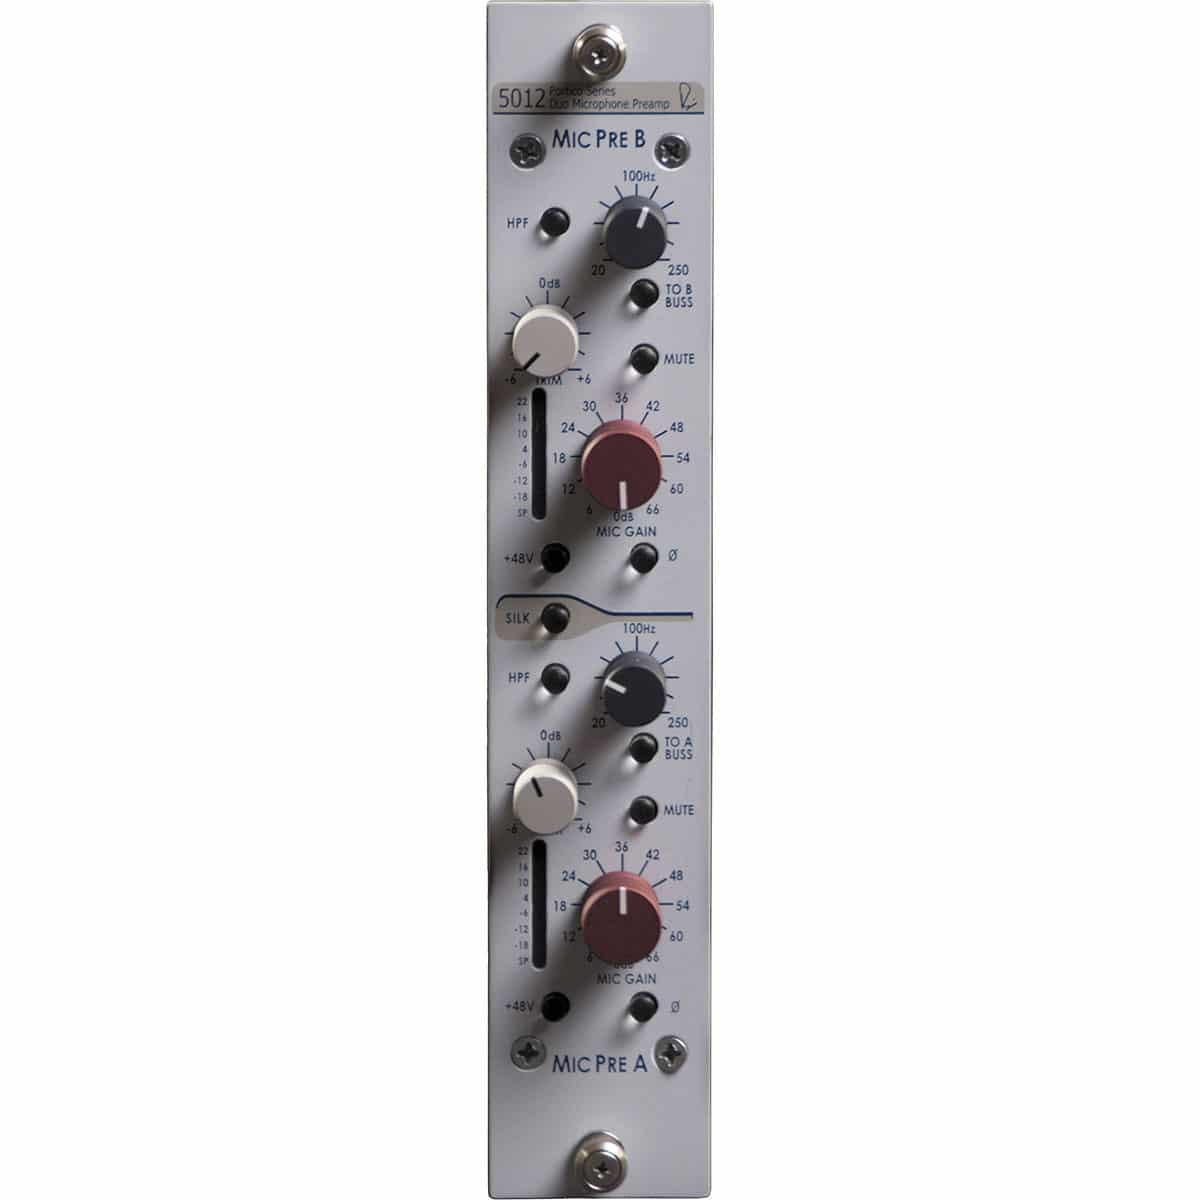 Rupert Neve 5012 V 01 Pro Audio, Outboard, Preamplificatori Microfonici